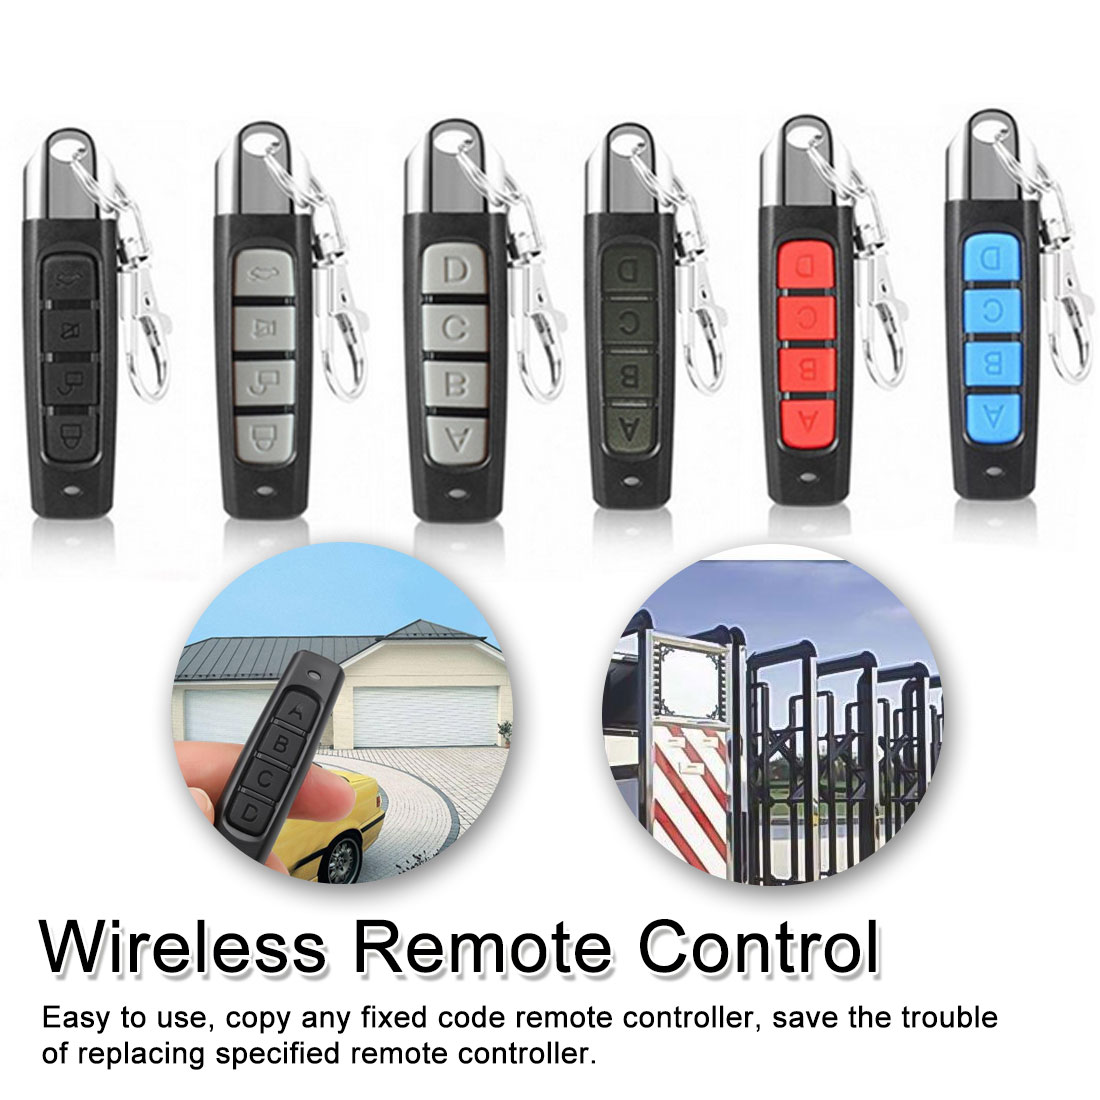 Universal Wireless Remote Control 433 Mhz Remote Control Garage Gate Door Opener Duplicator Clone Cloning Code